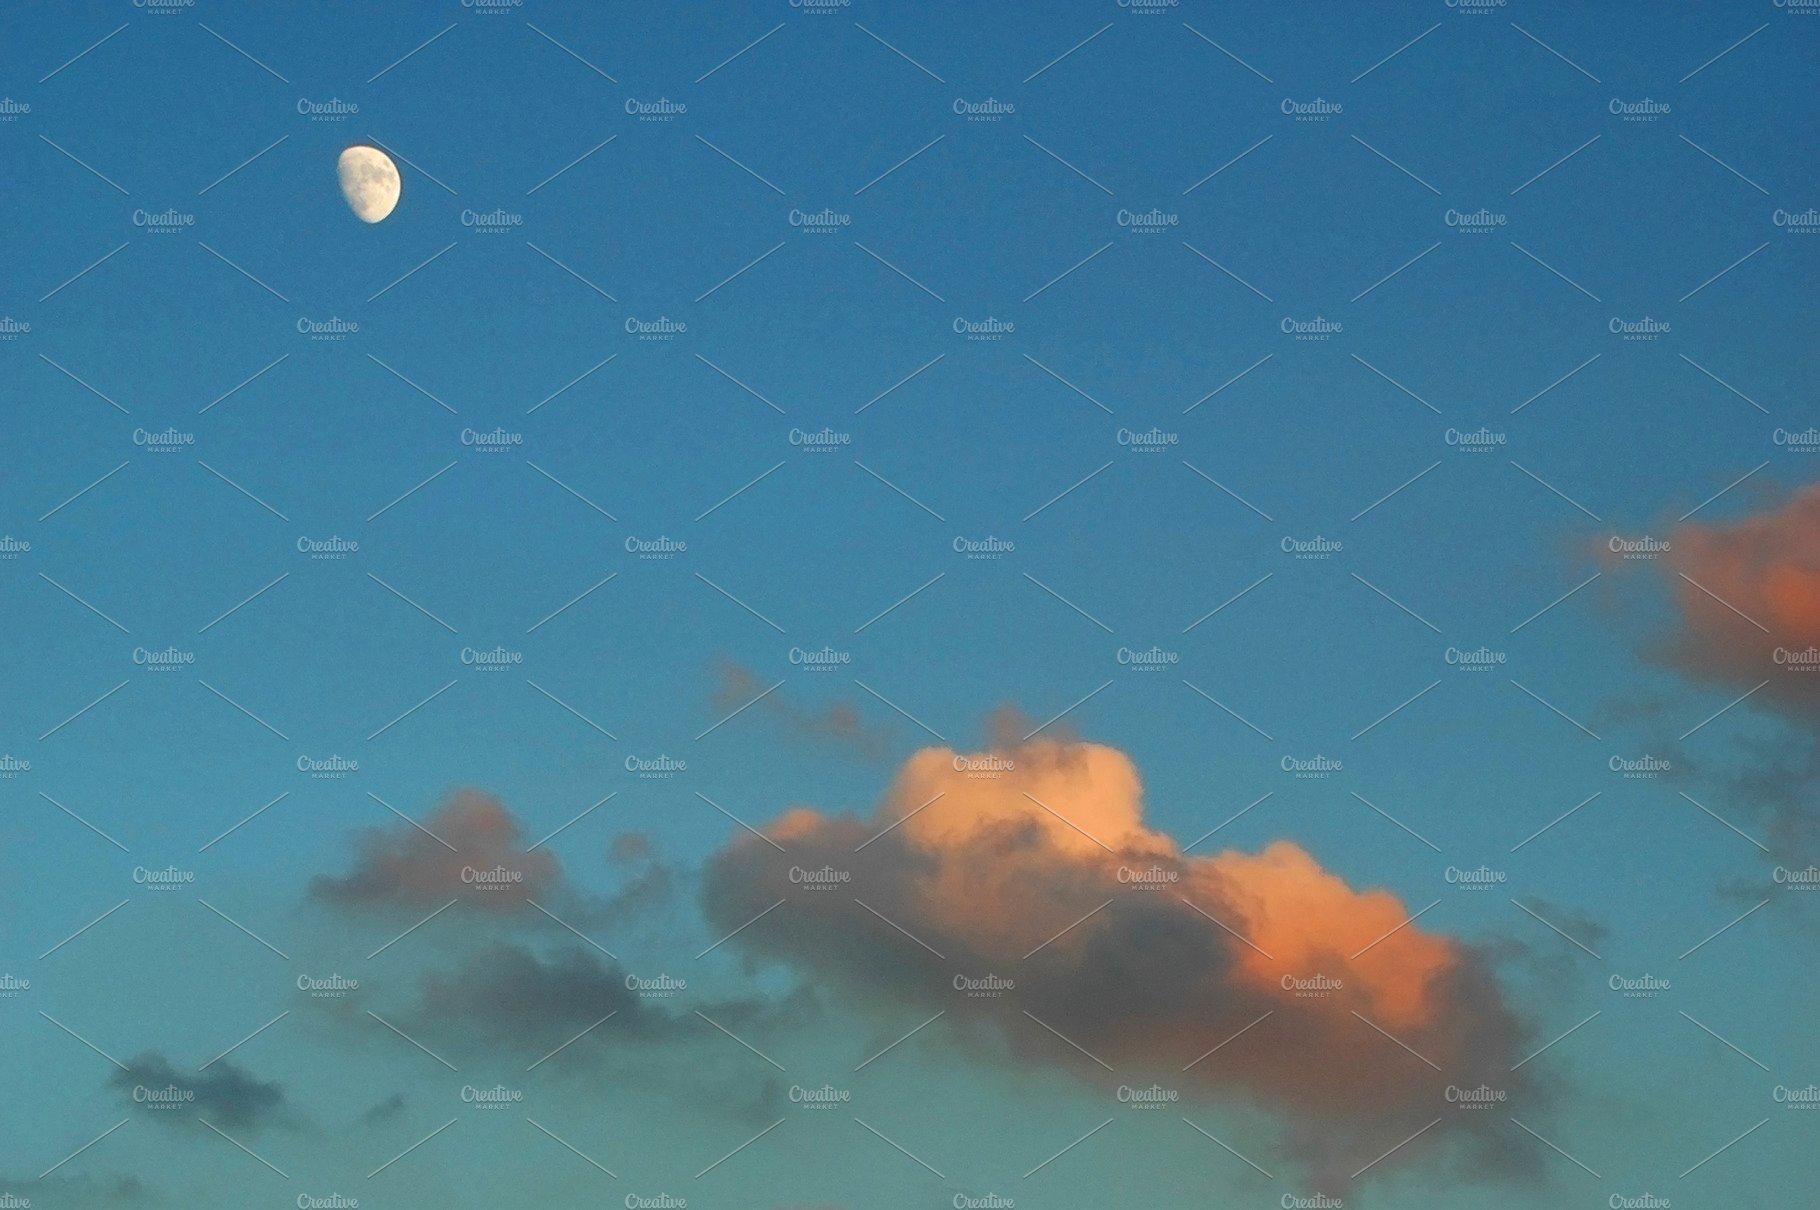 moon daylight high quality nature stock photos creative market moon daylight